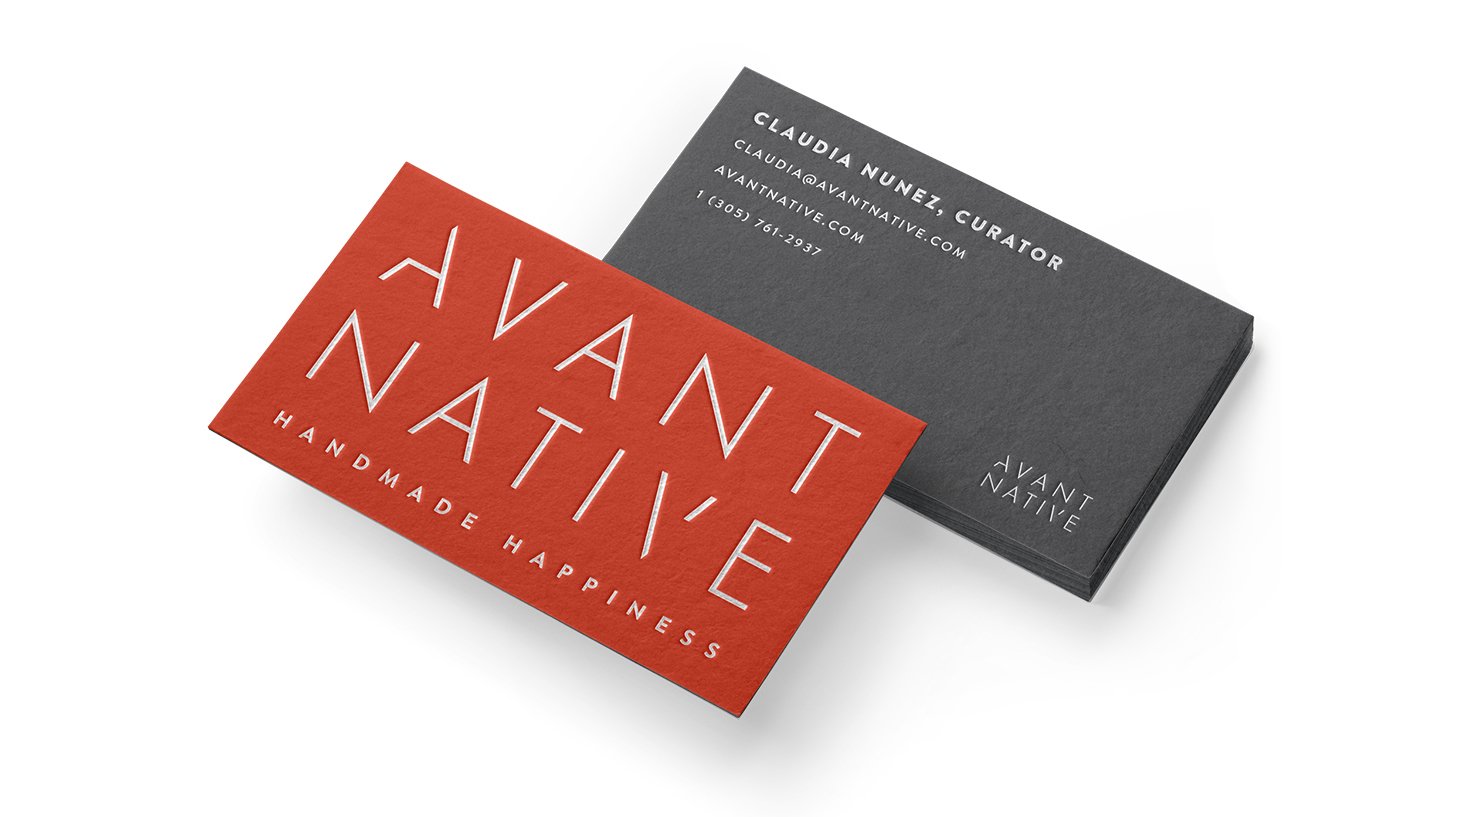 business card design for avant native